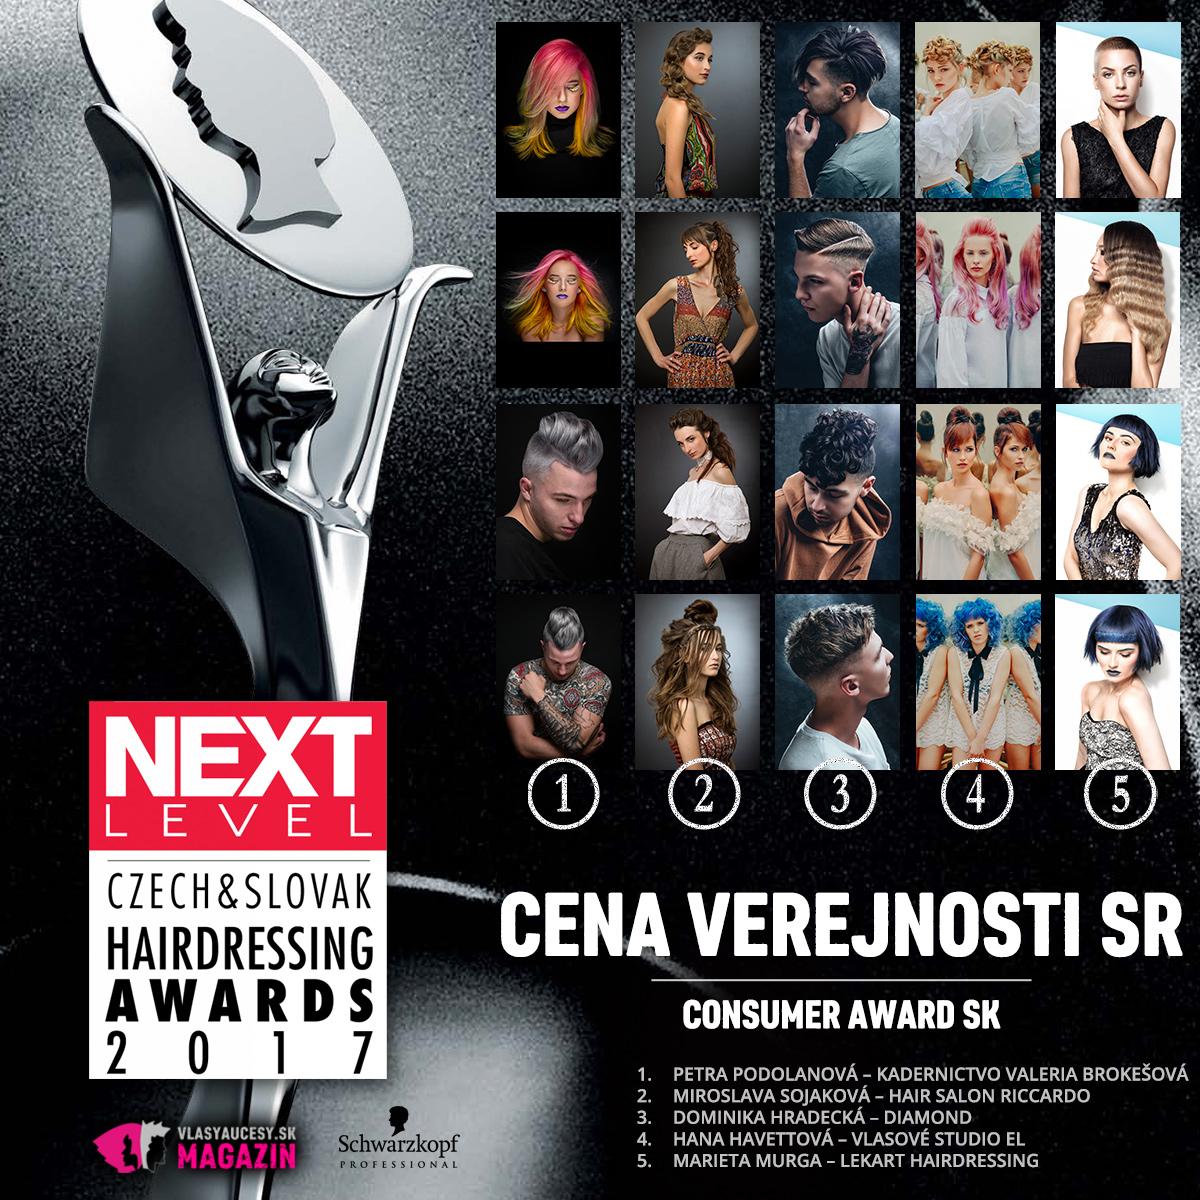 Czech&Slovak Hairdressing Awards 2017 – kategória Cena verejnosti SR.